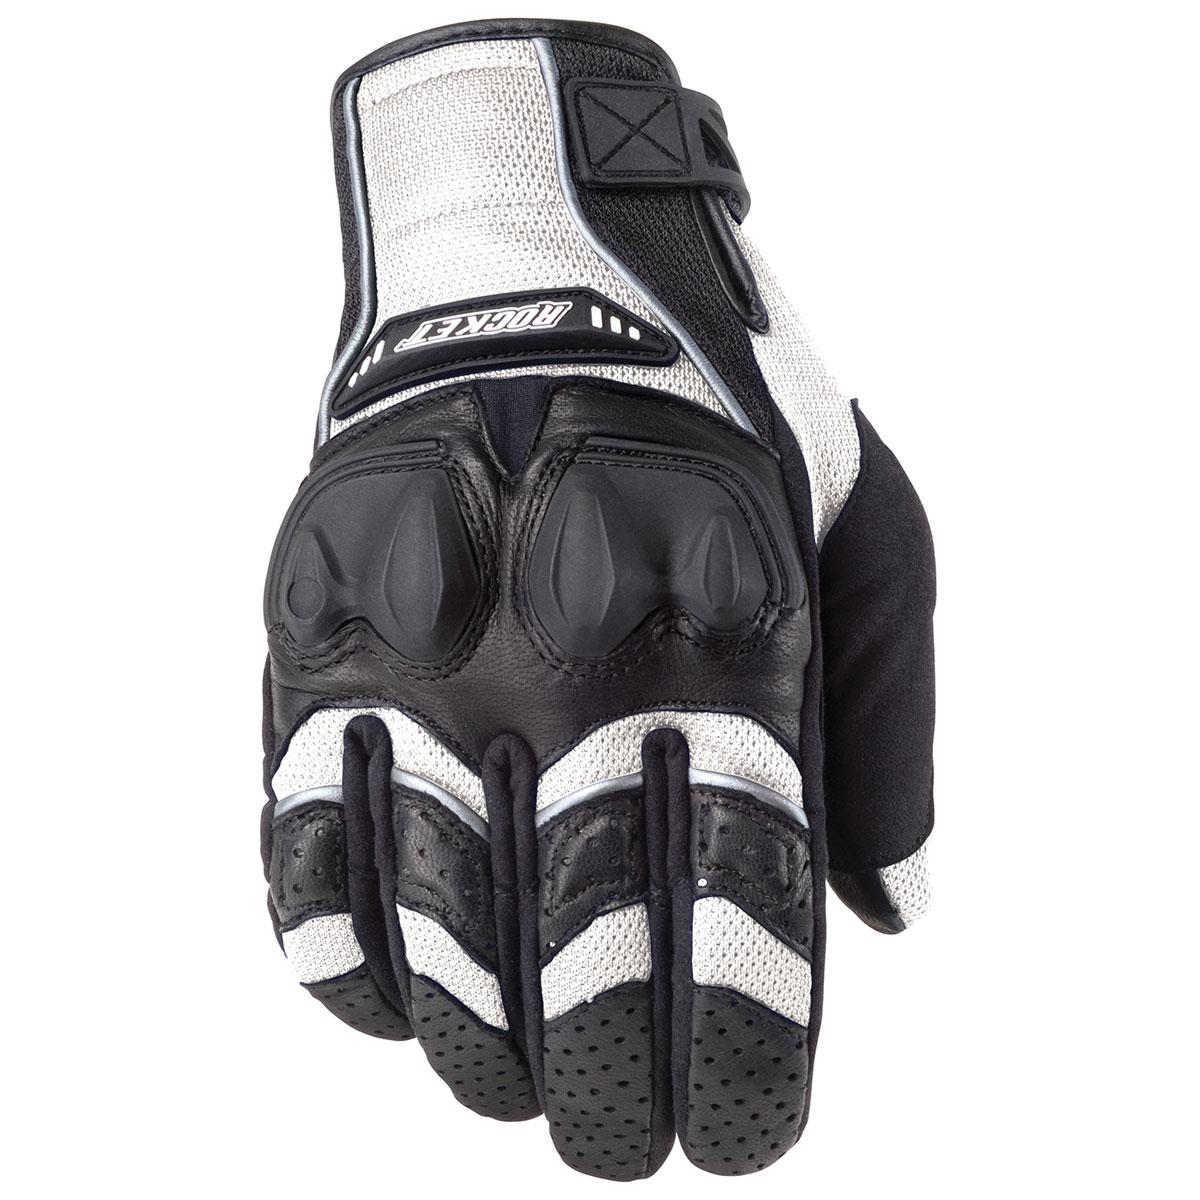 Joe Rocket Men's Phoenix 4.0 White/Black Gloves